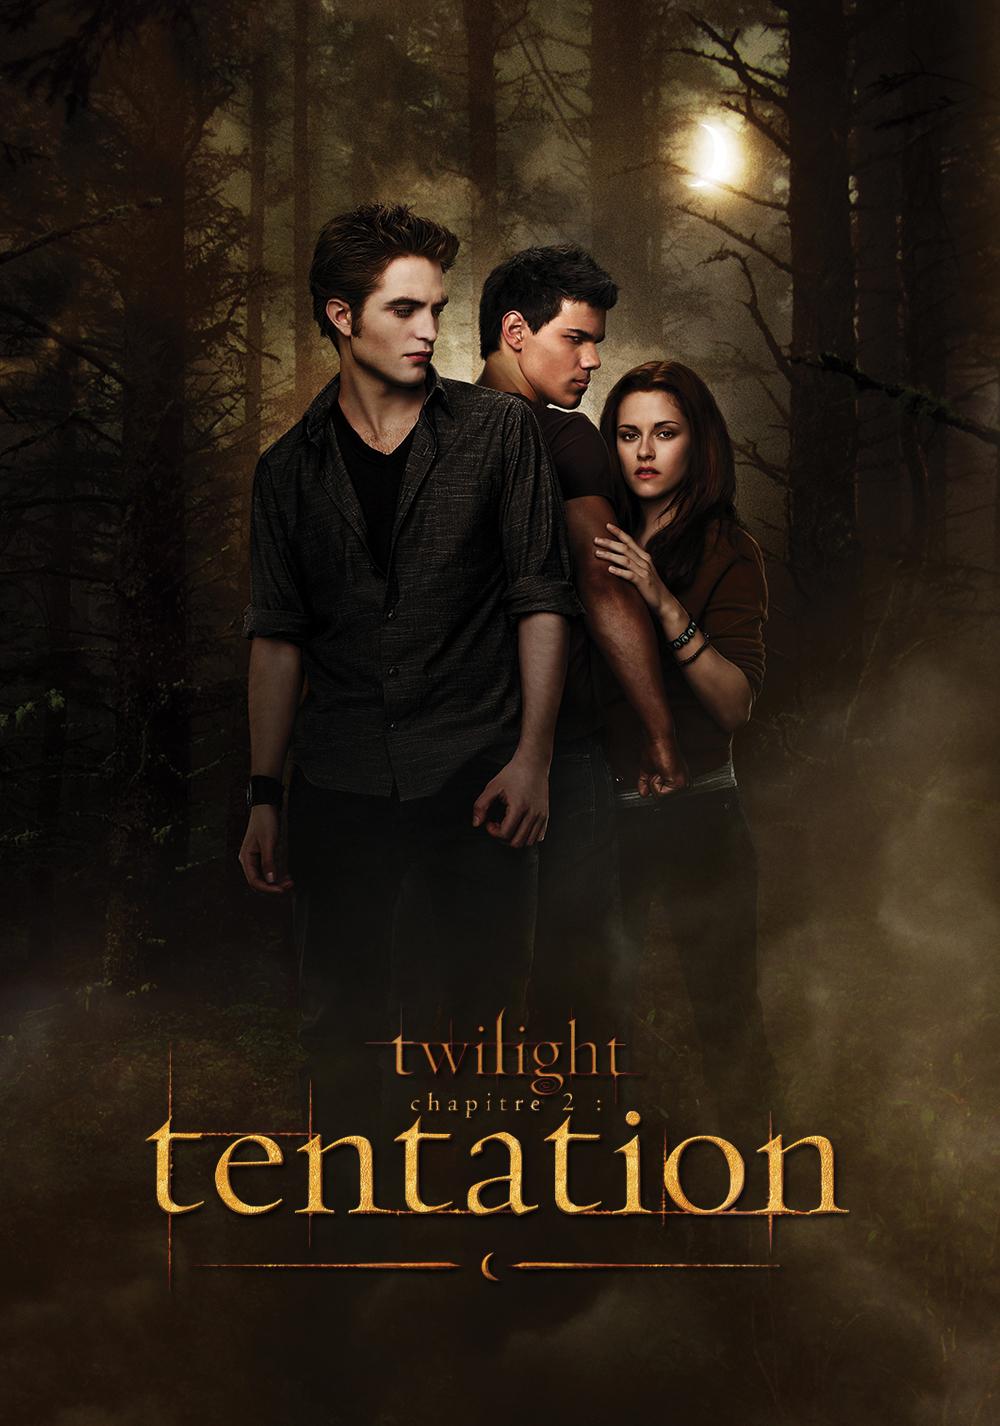 Twilight 2 the new moon movie